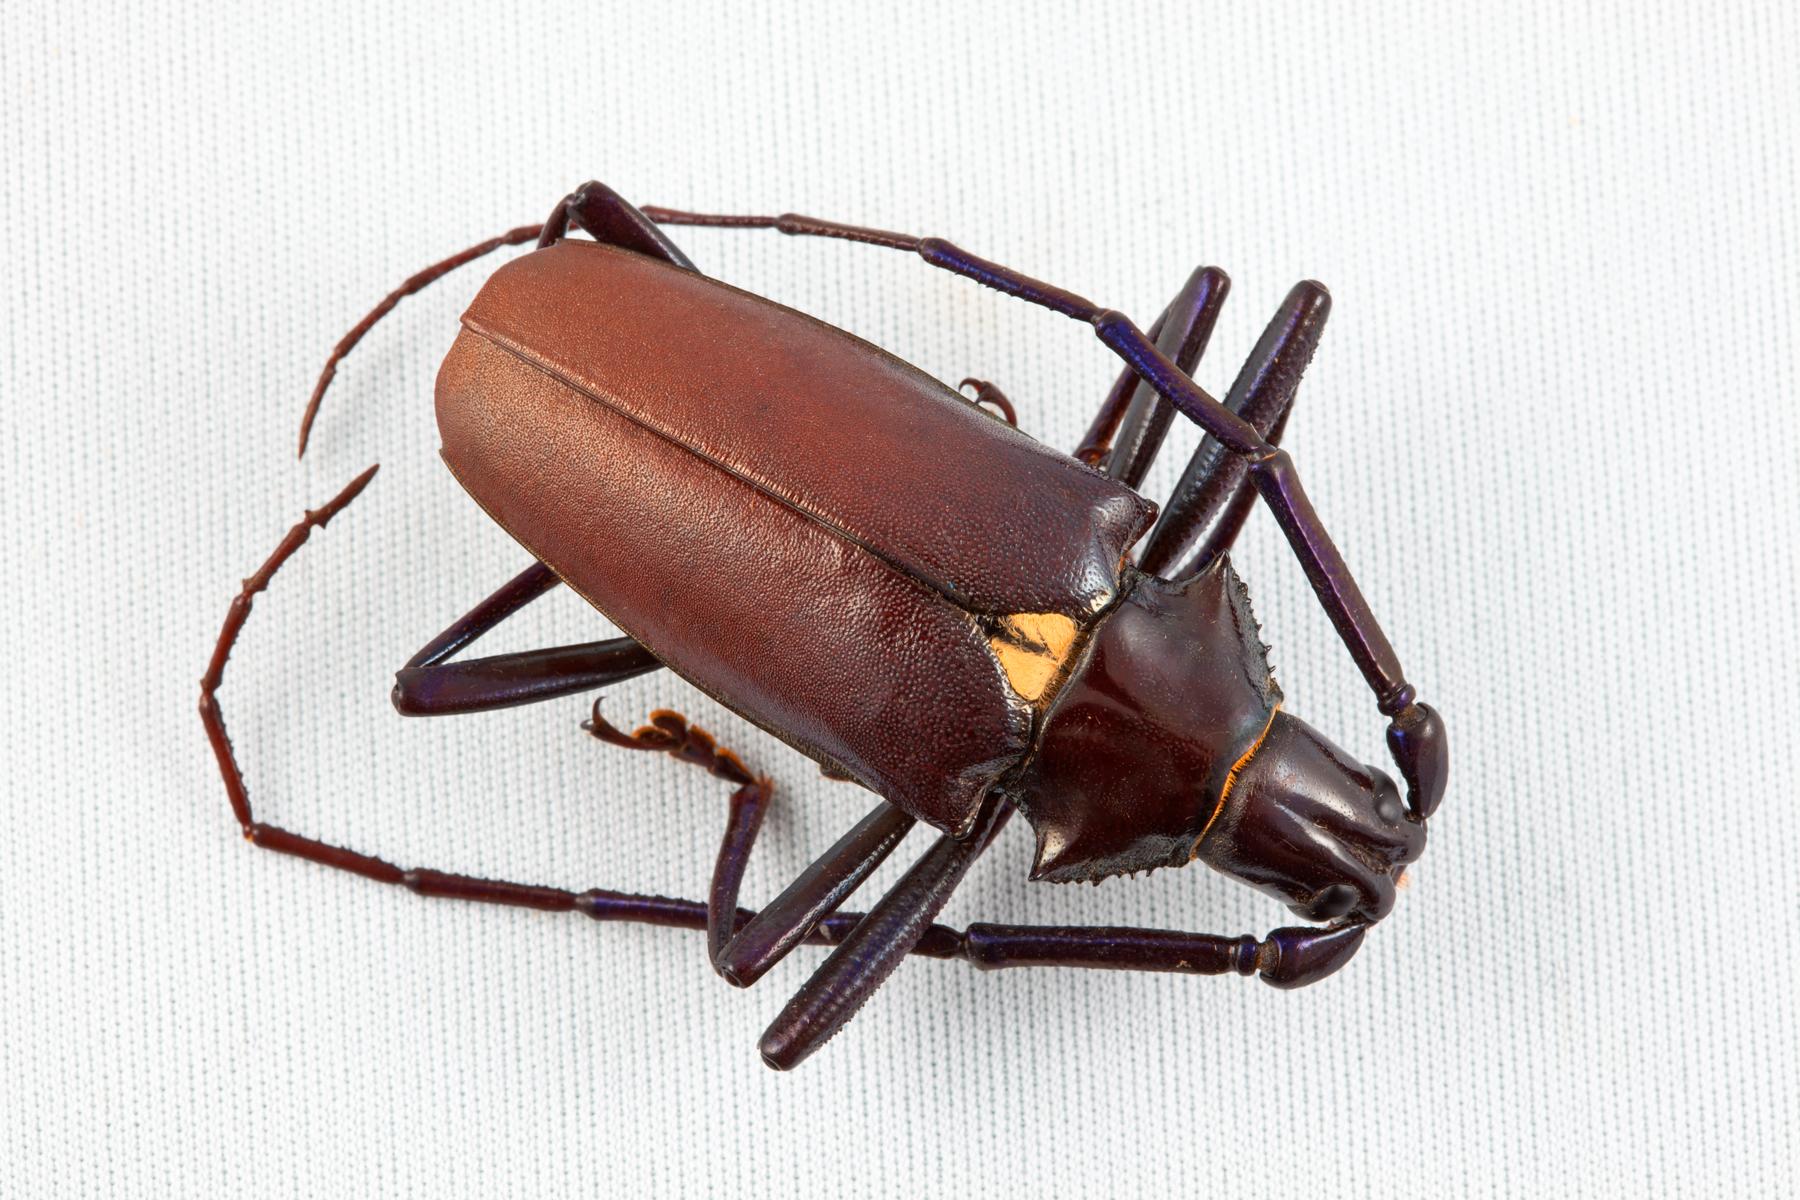 Pyrodes Longiceps Beetle, Leg, Legs, Macro, Isolation, HQ Photo